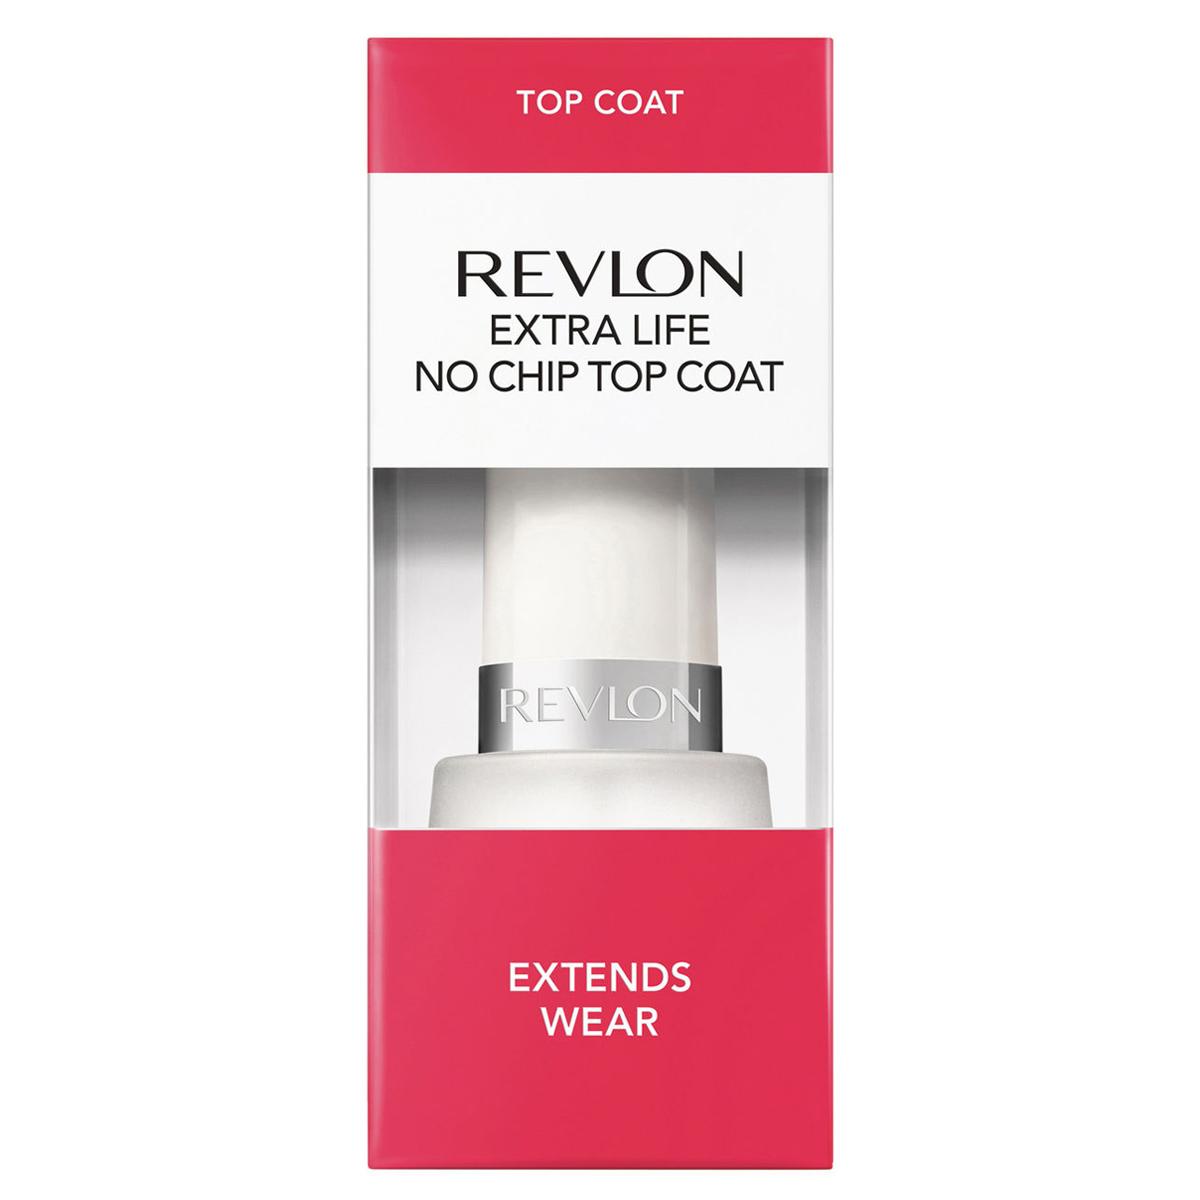 Revlon - Top Coat Extra-Life - Soin Protecteur Fixateur